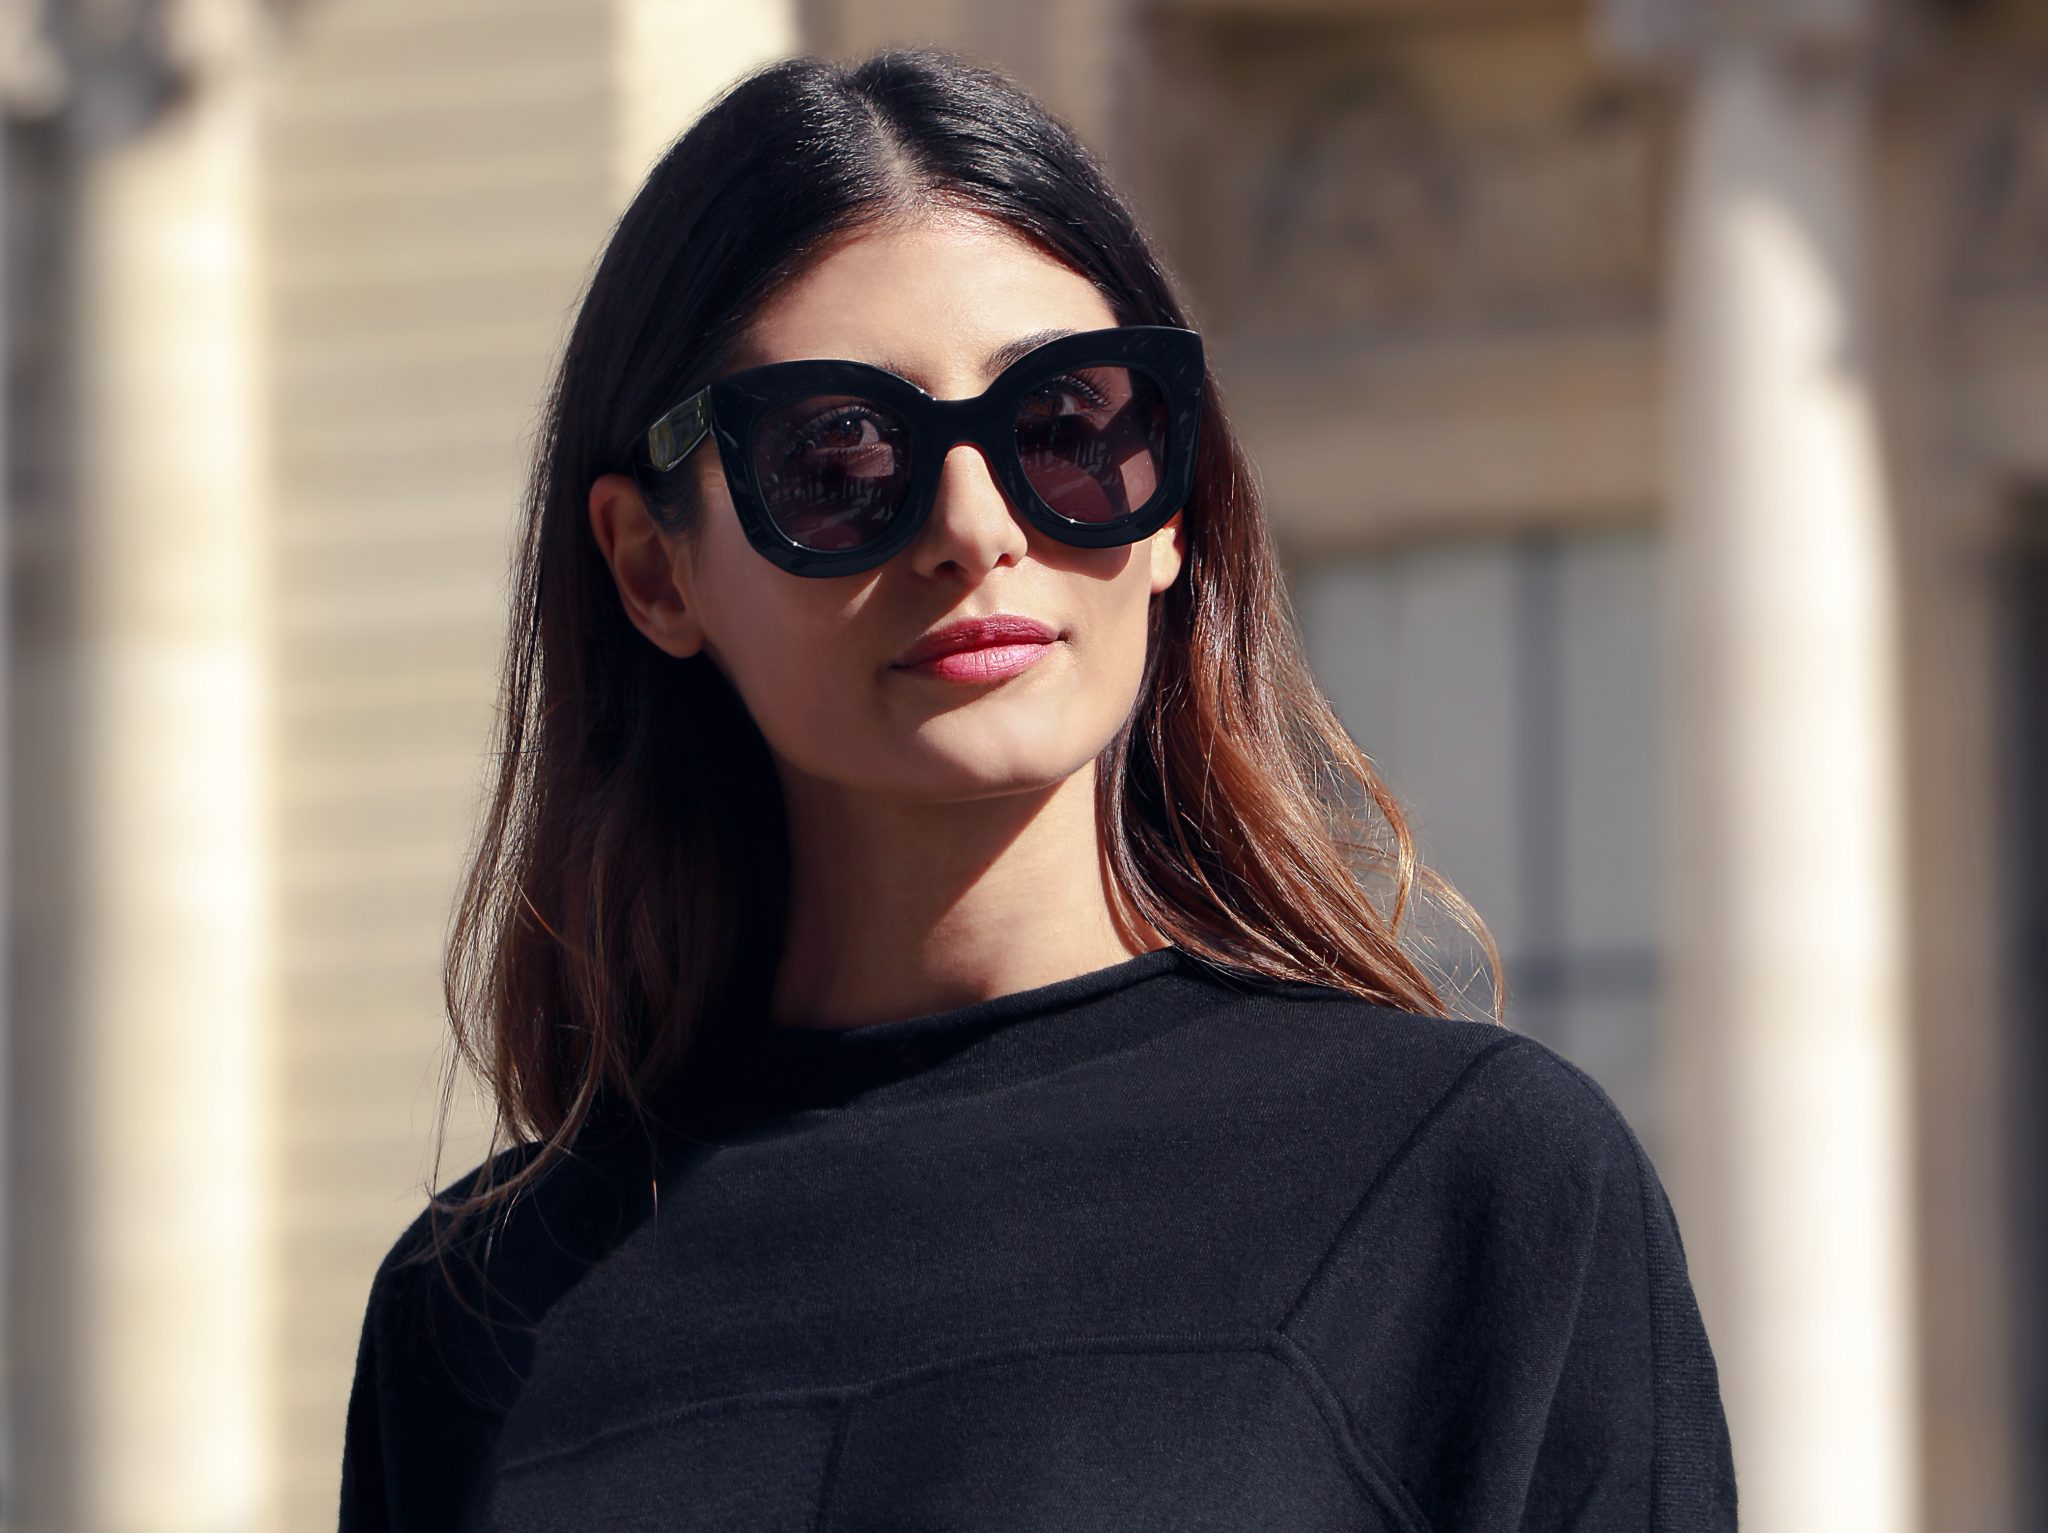 French Photographer Fashion Photography Elie Saab Model